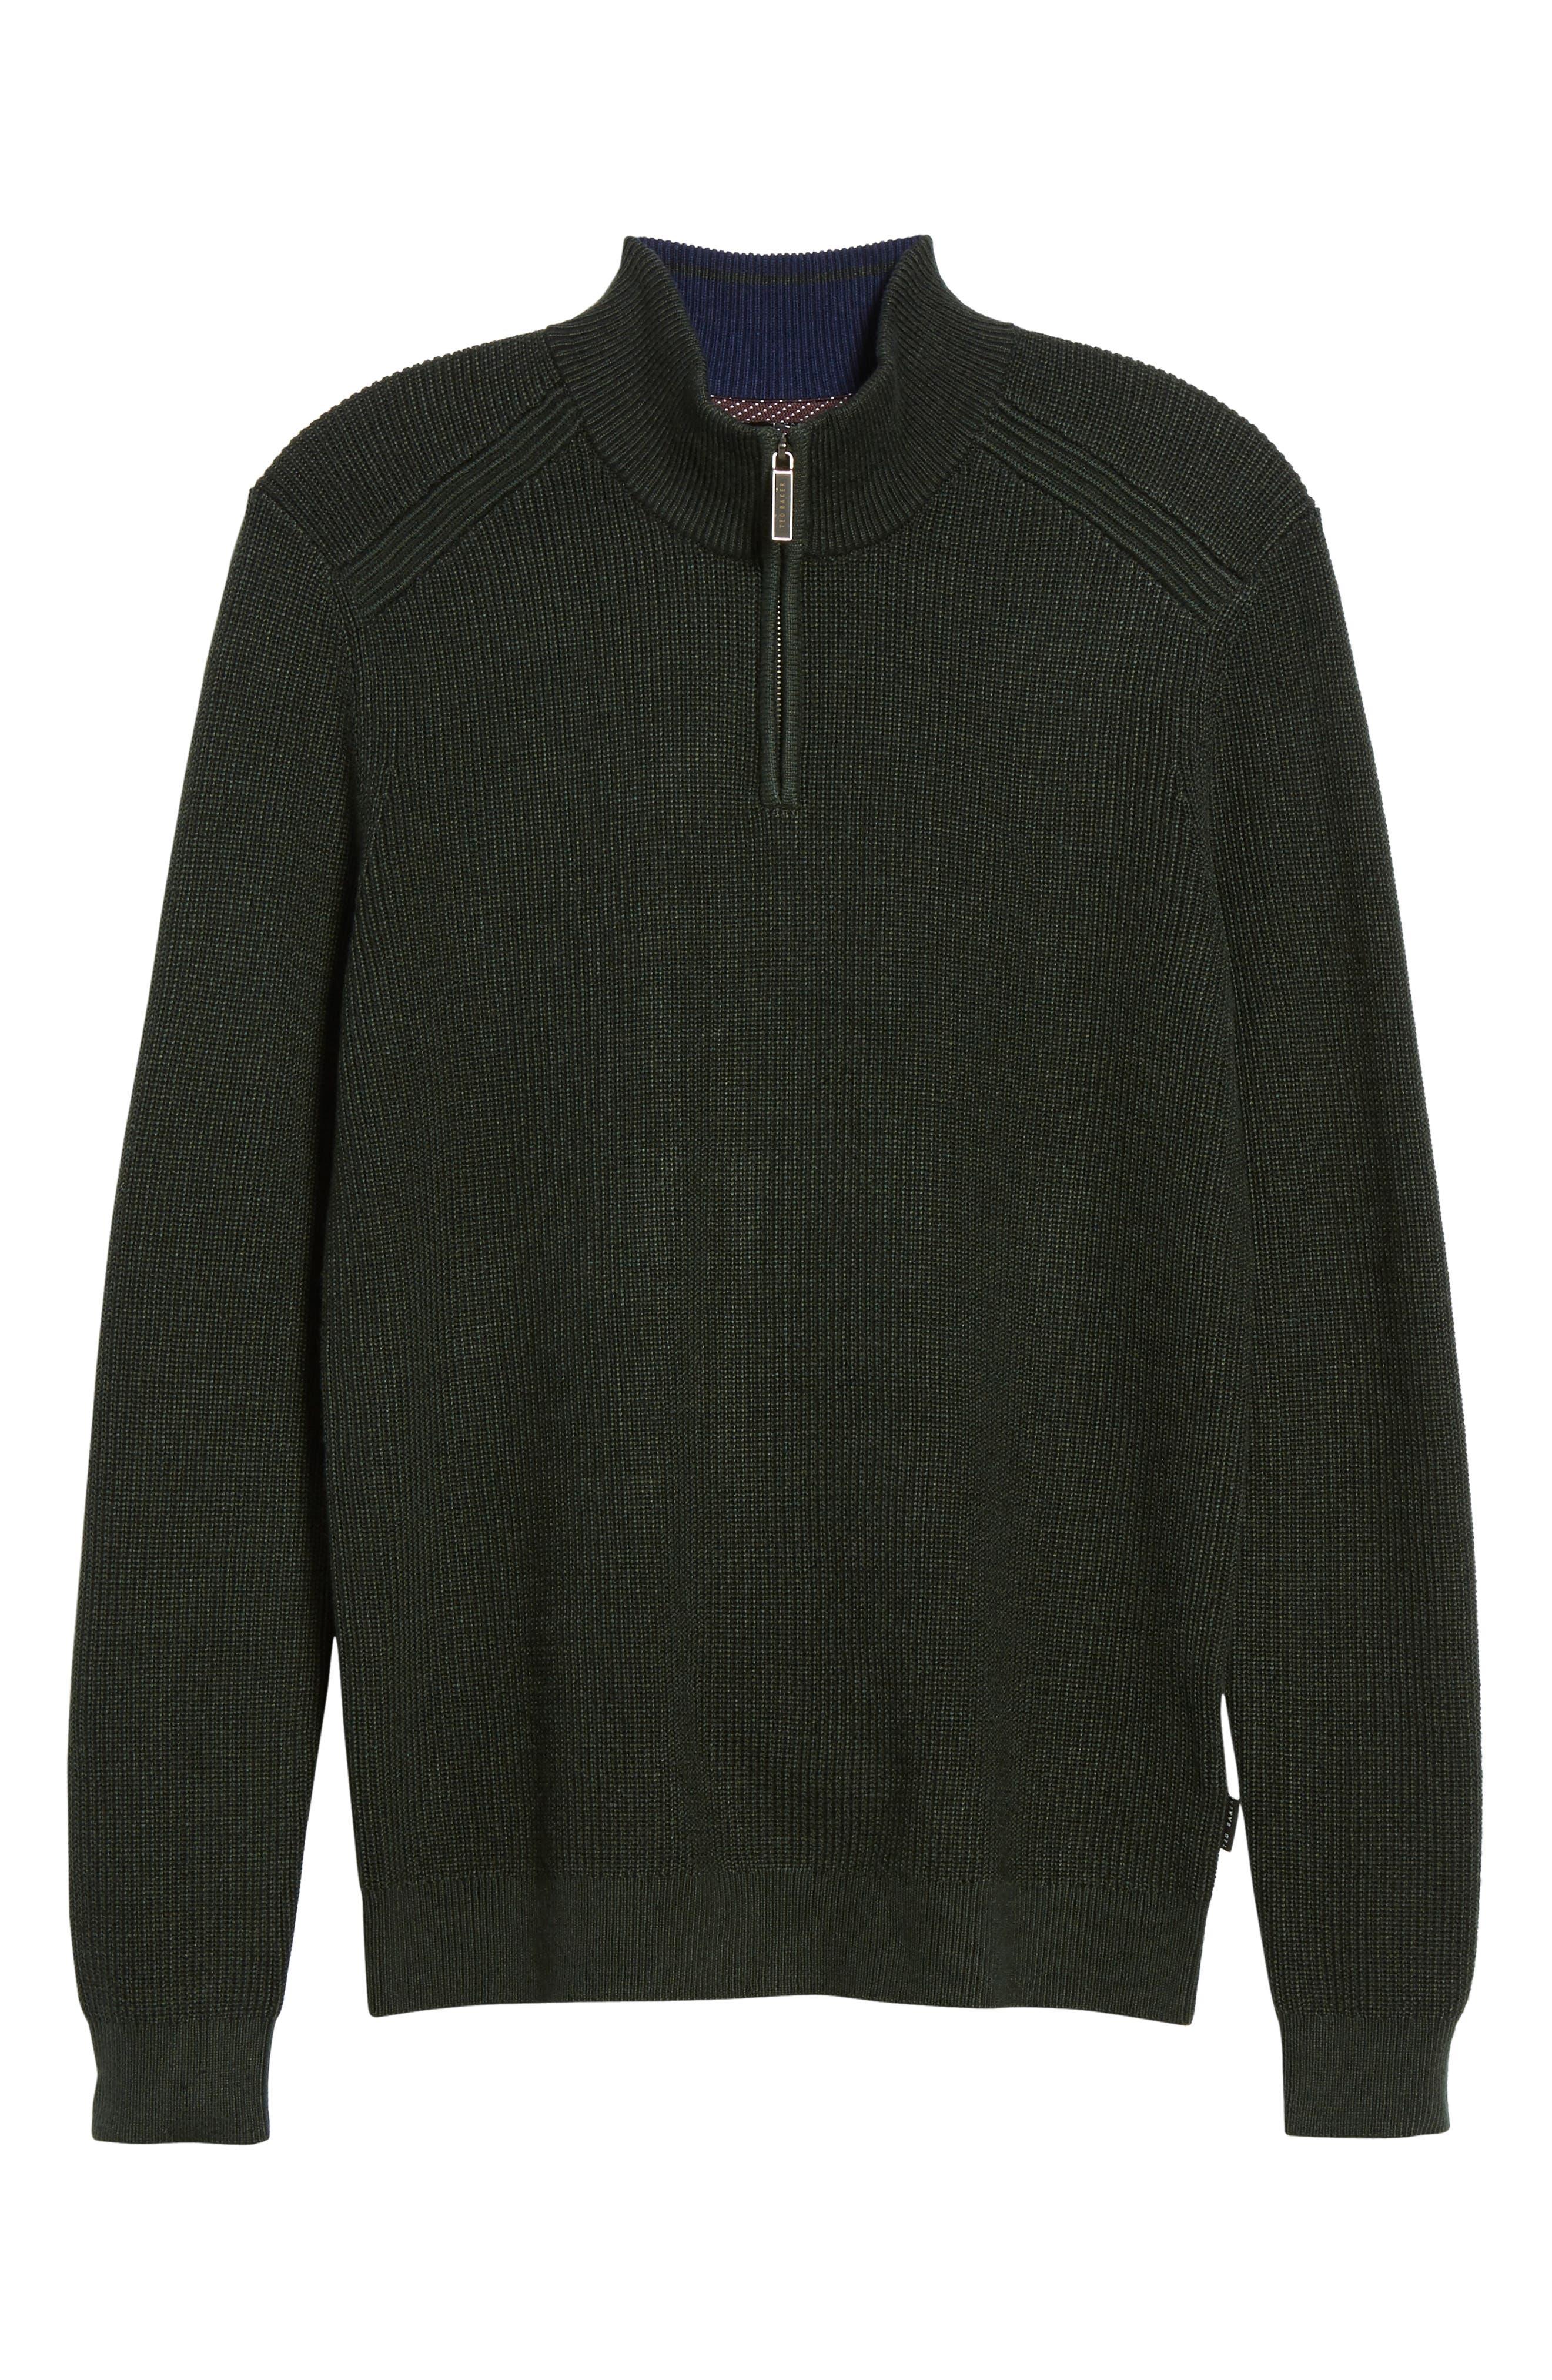 Stach Quarter Zip Sweater,                         Main,                         color, Dark Green